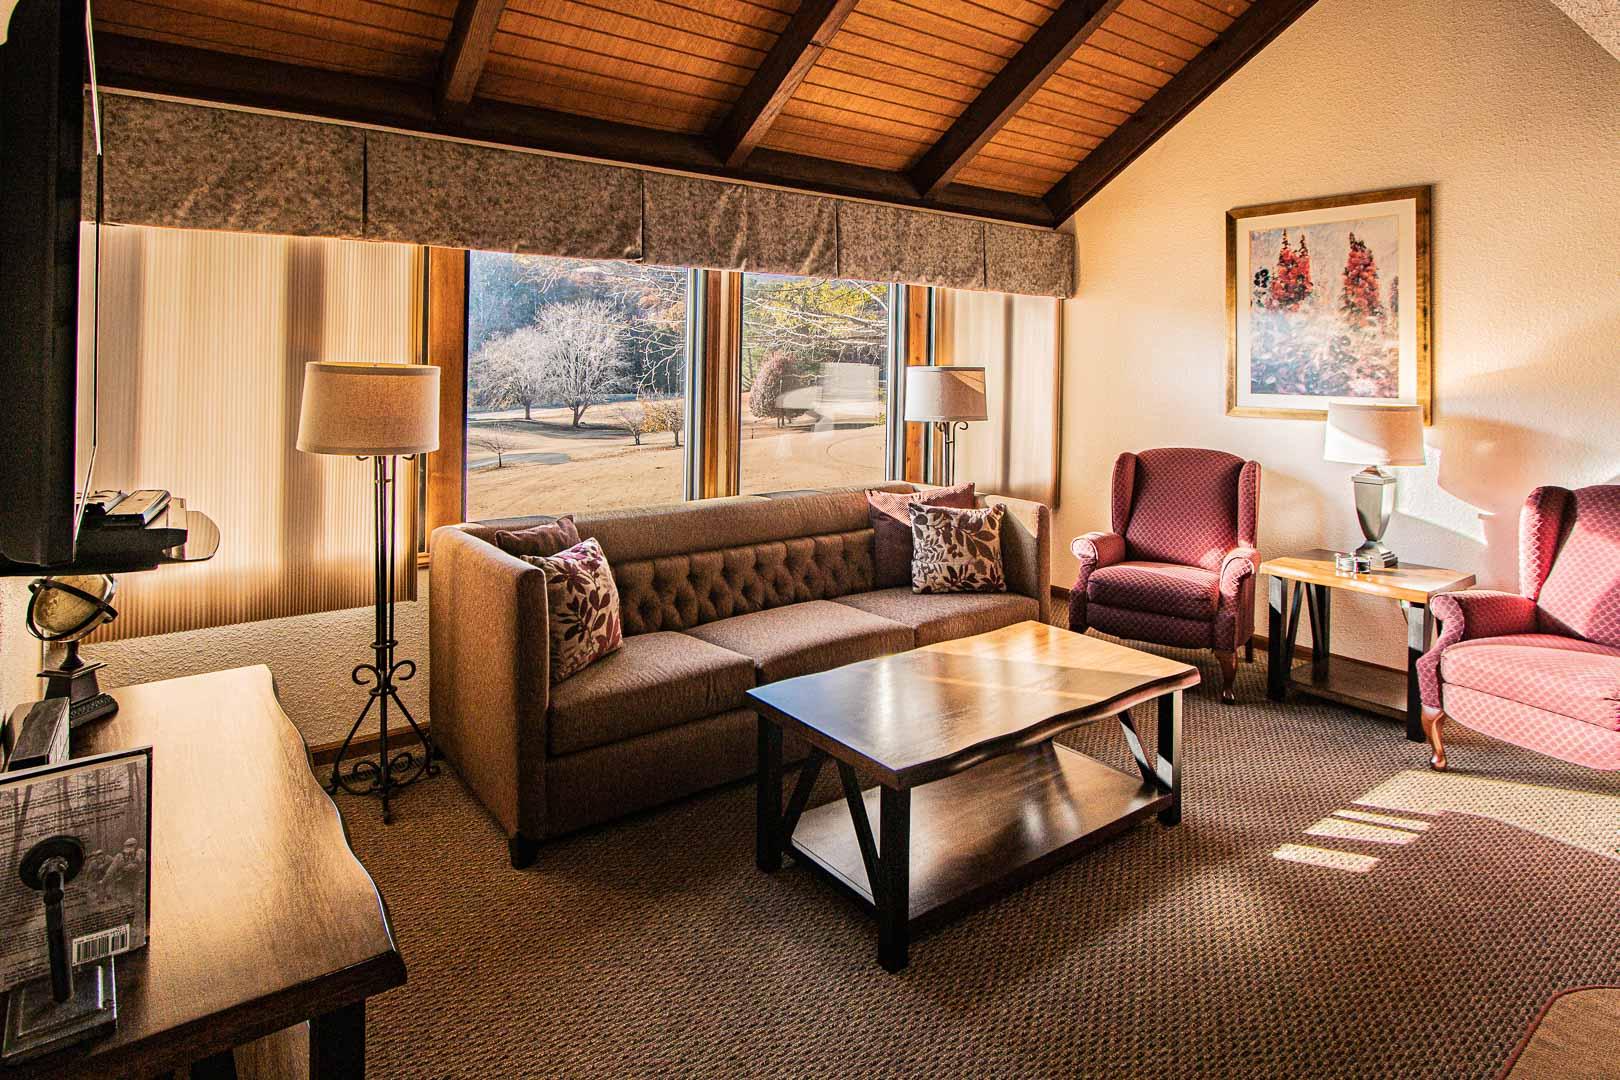 A cozy living room area at VRI's Mountain Loft Resort in North Carolina.